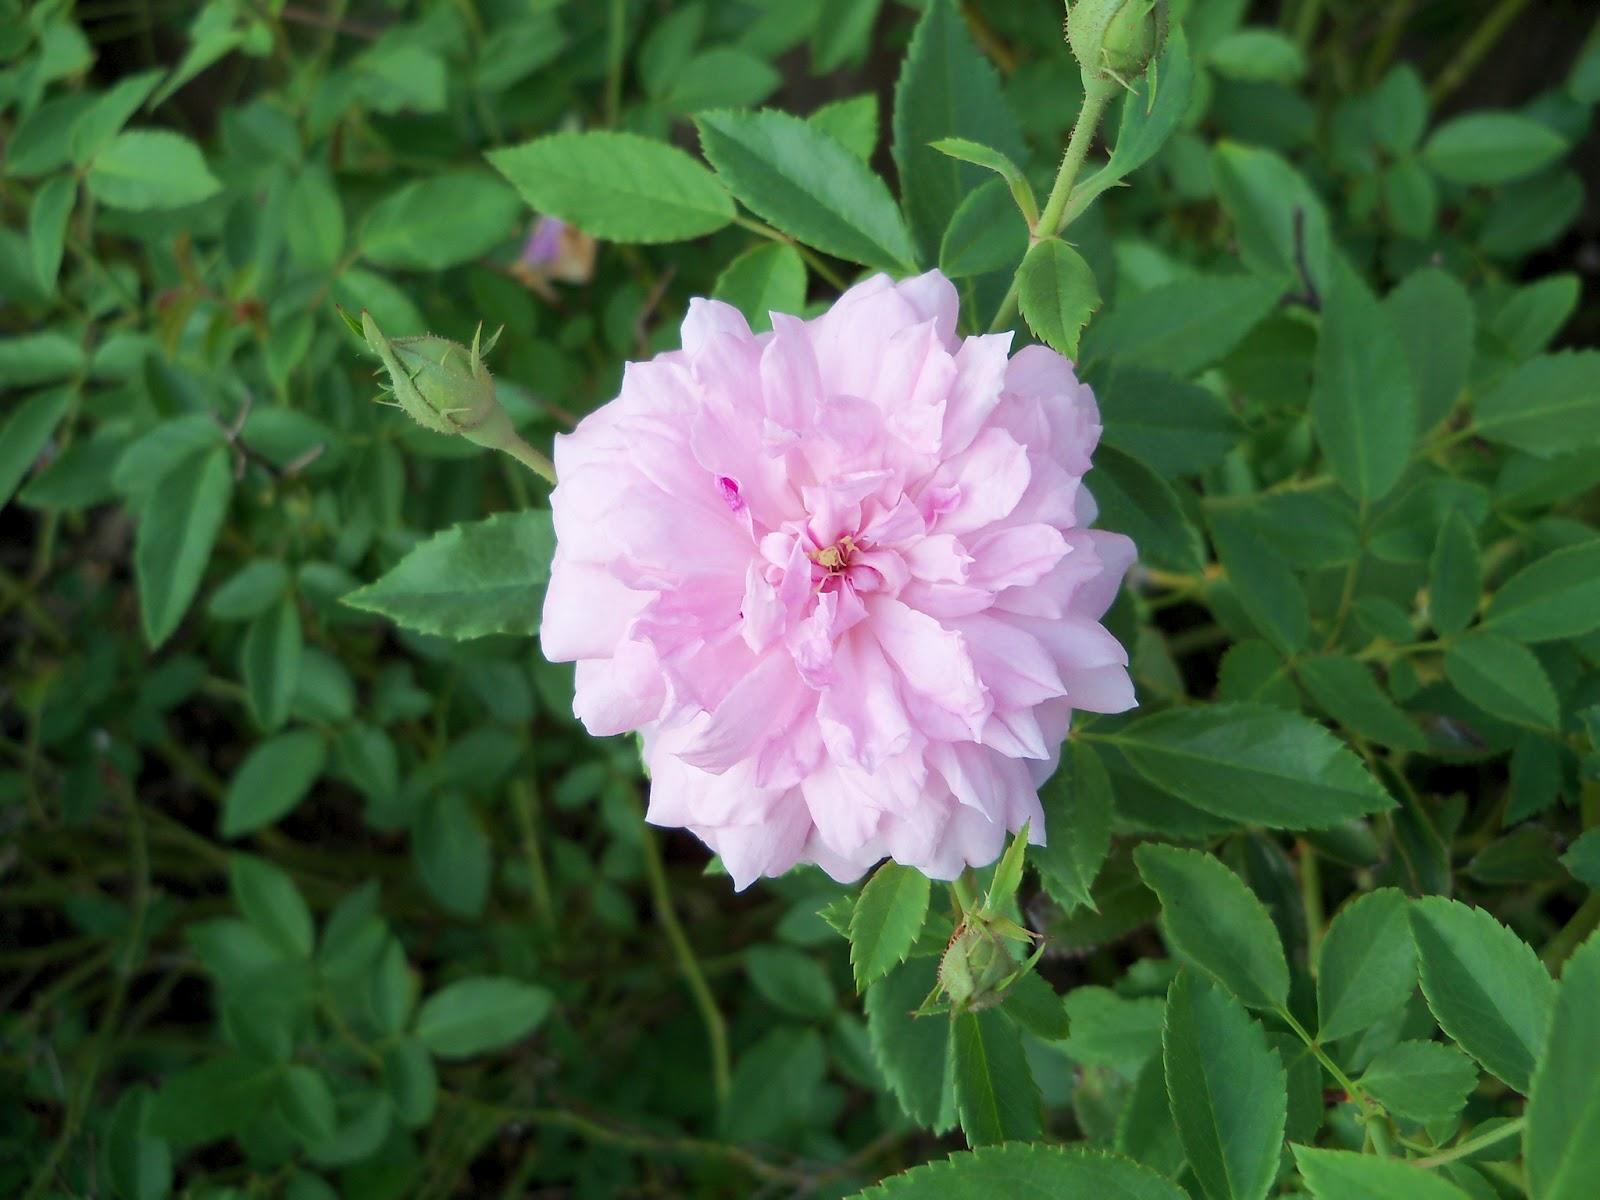 Gardening 2011 - 115_0450.JPG